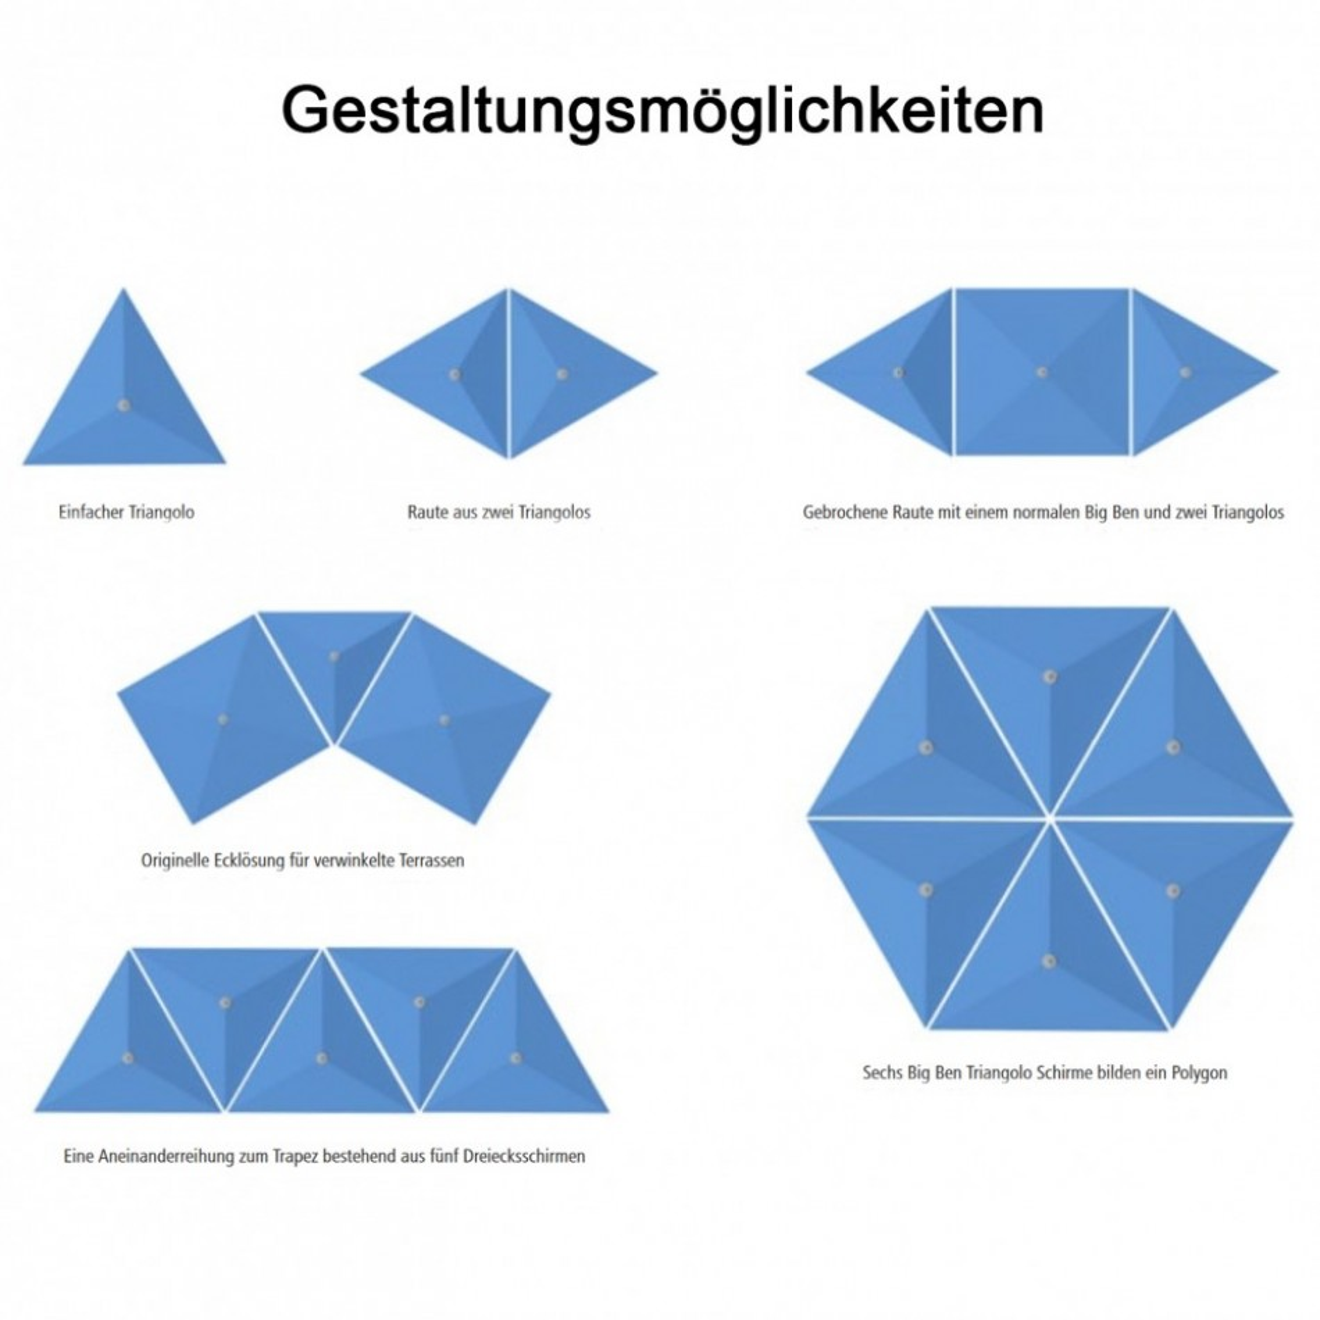 Heizsysteme Uberblick Vielzahl - richardkelsey.co